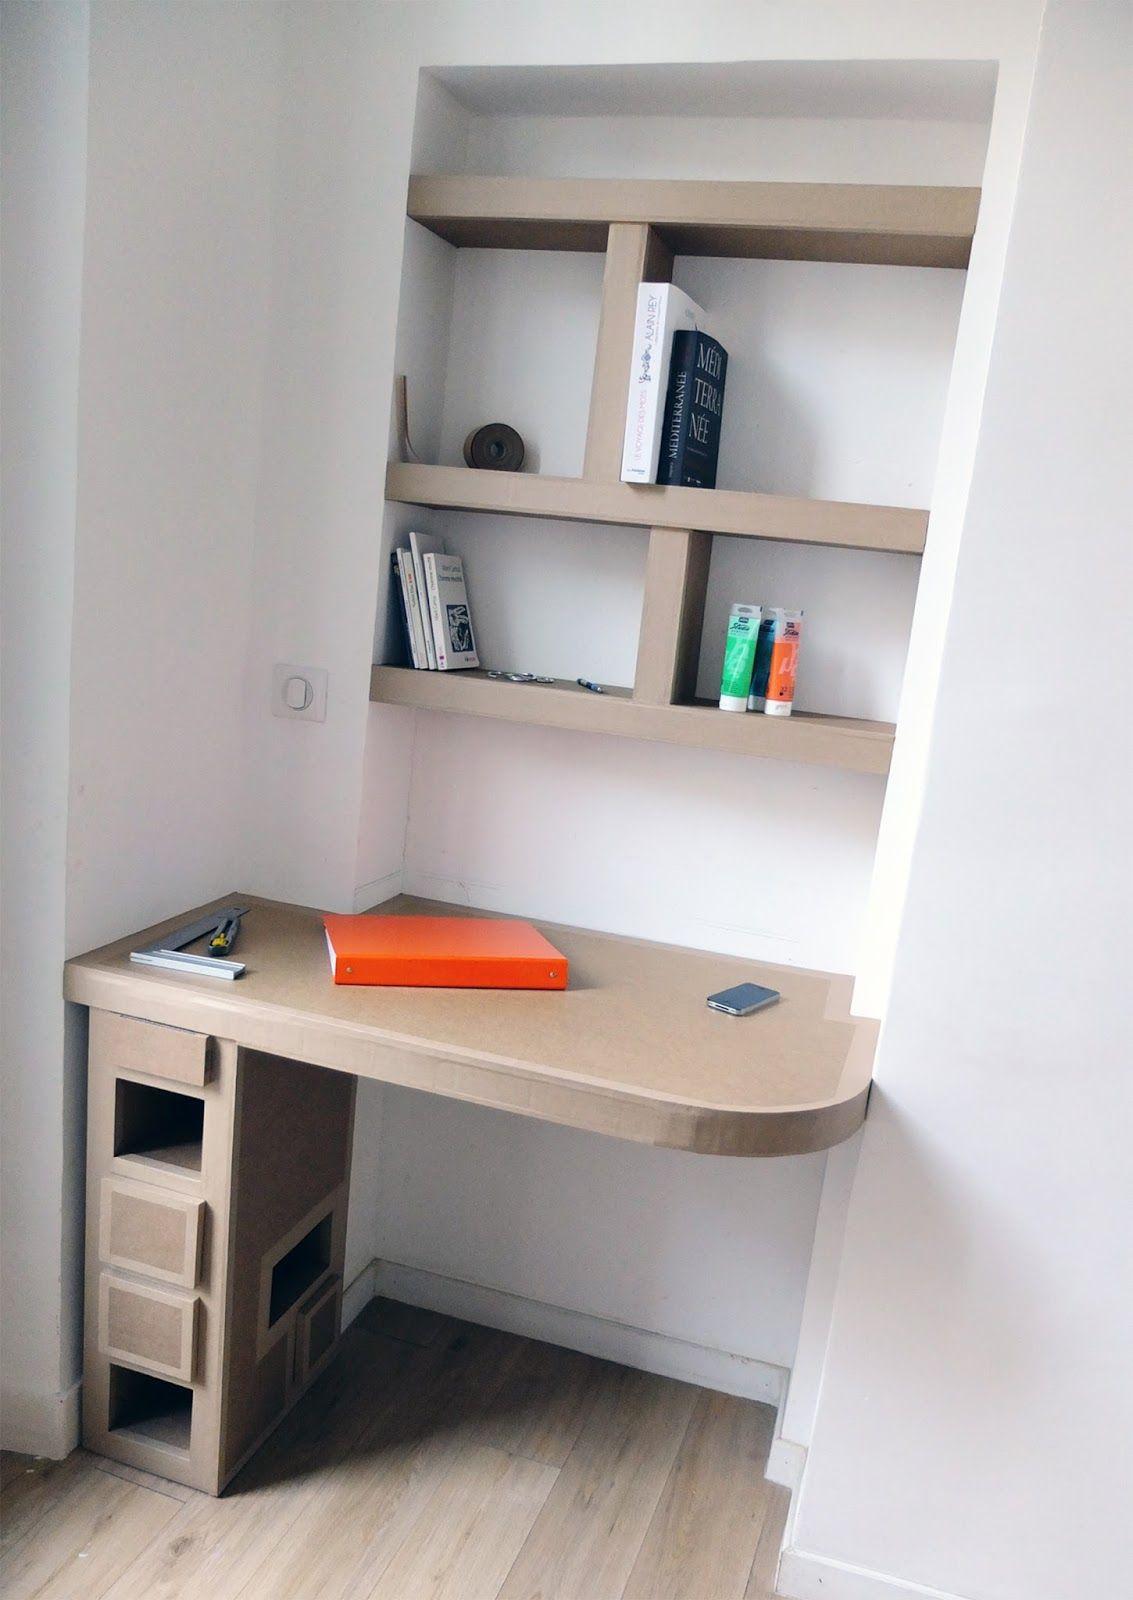 Shelf And Cardboard Office Cart N Pinterest Estantes De  ~ Estanterias De Carton Reciclado